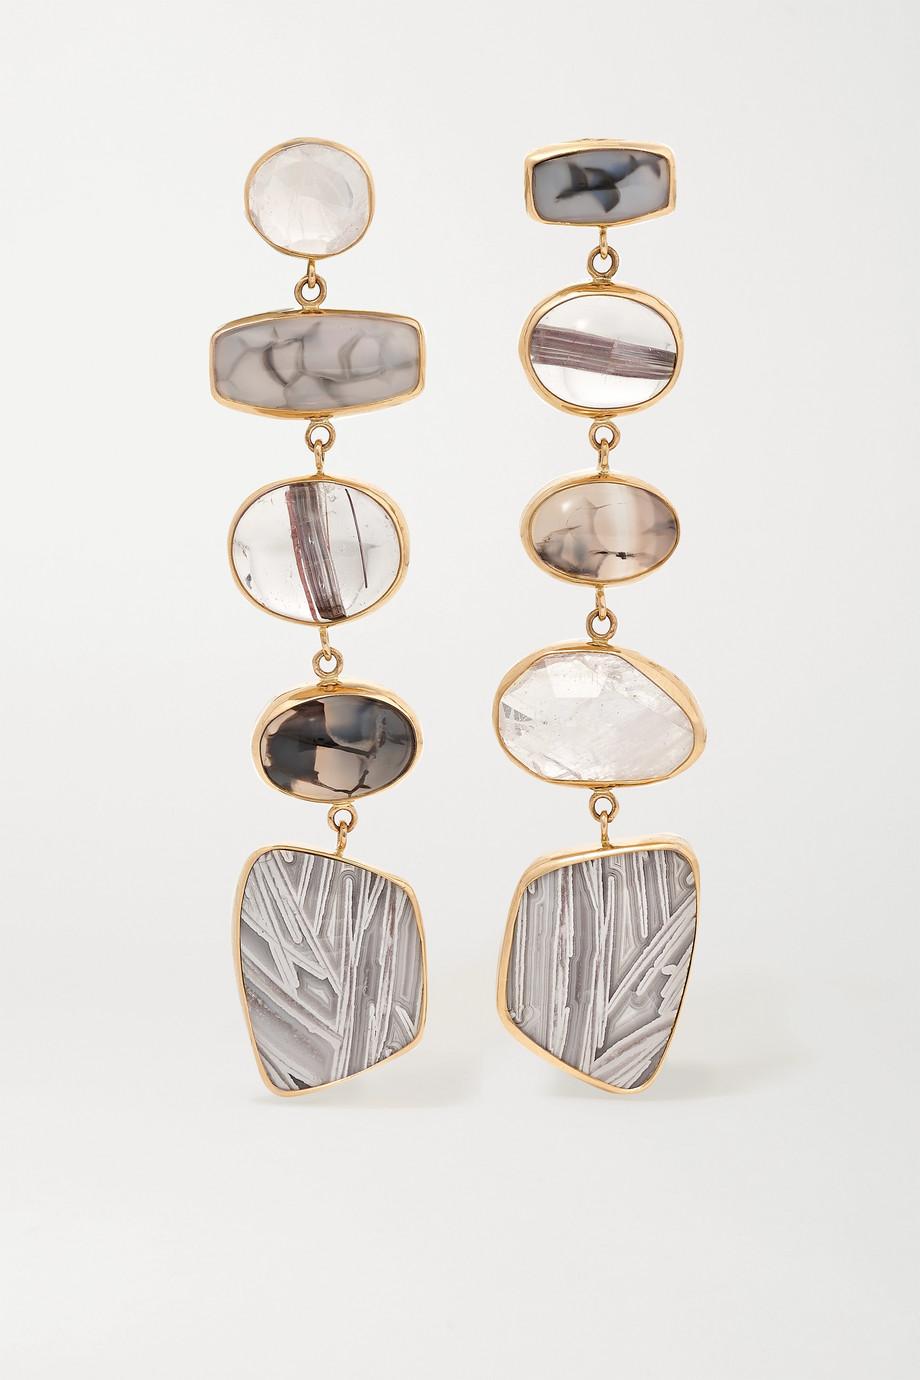 Melissa Joy Manning + NET SUSTAIN 14-karat gold multi-stone earrings